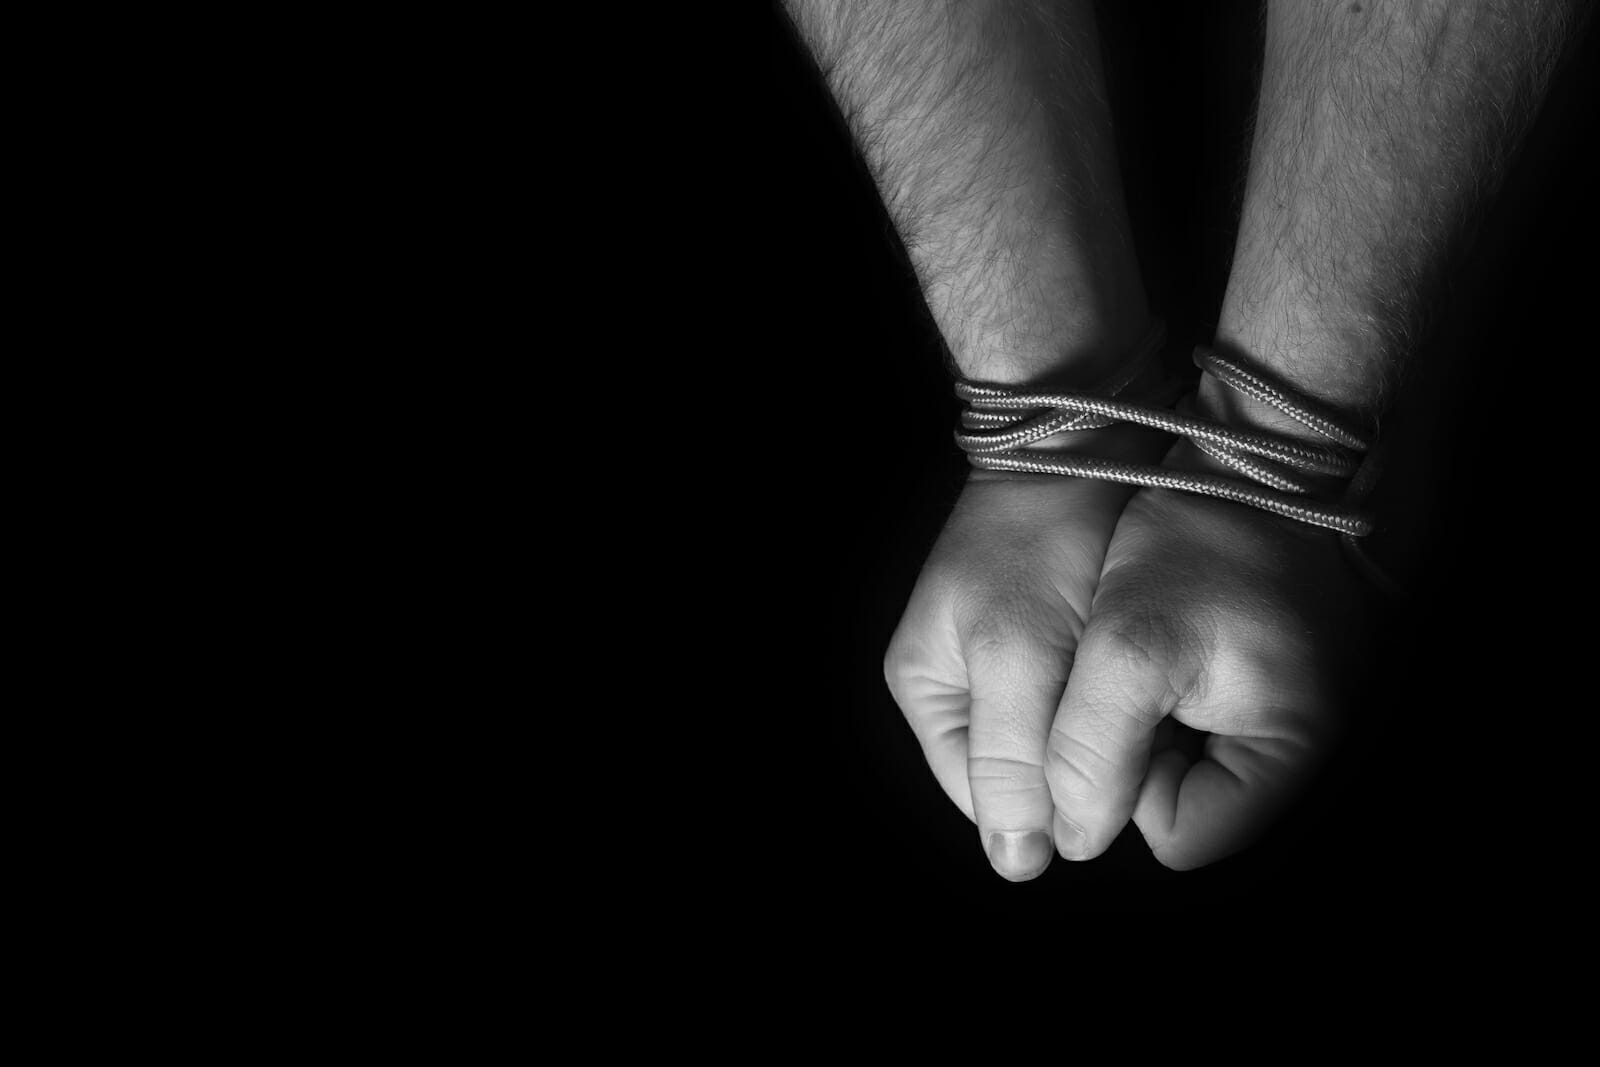 Slovaking human trafficking gang dismantled